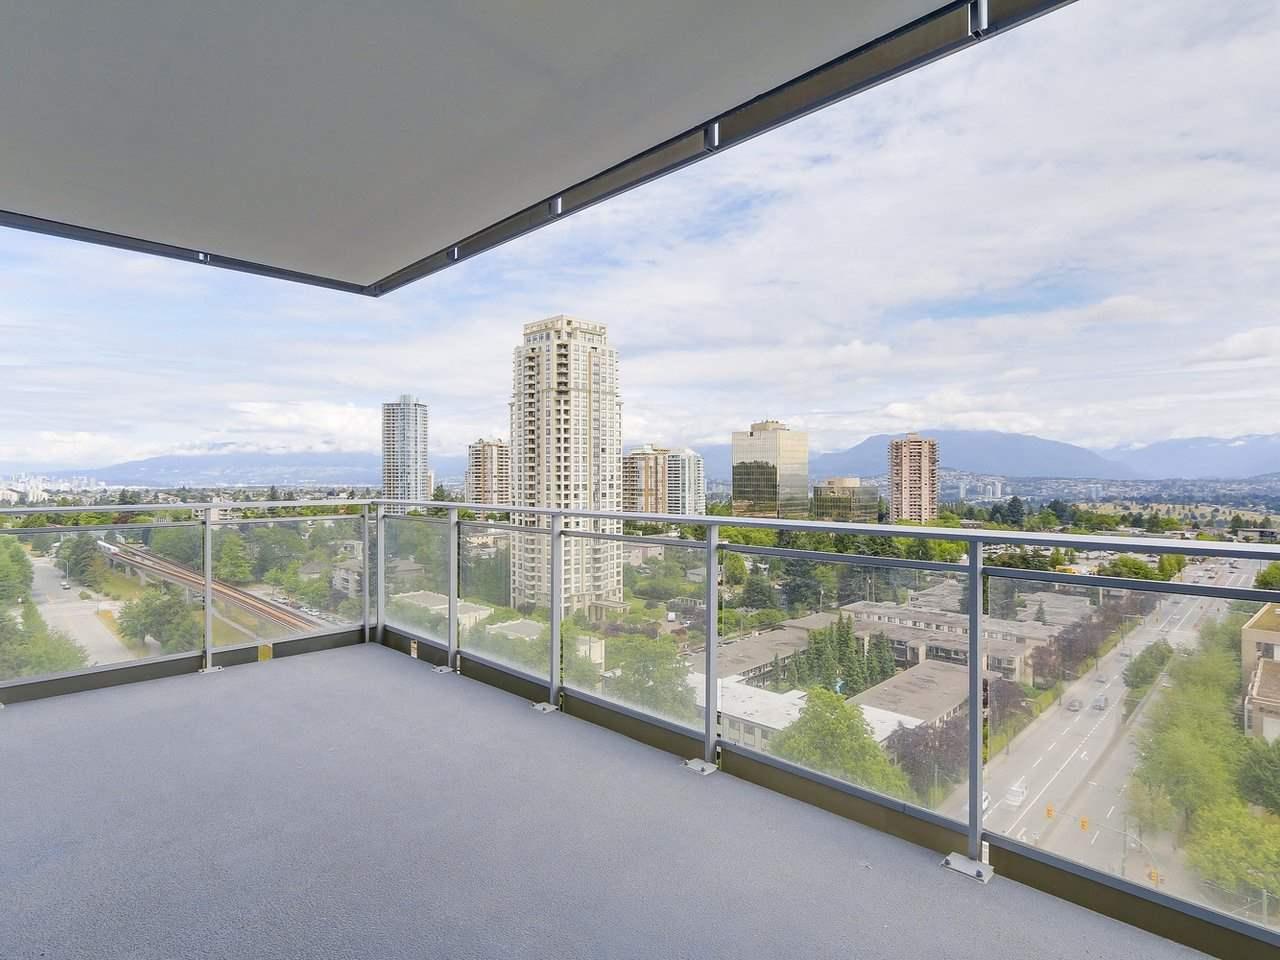 Condo Apartment at 1202 4360 BERESFORD STREET, Unit 1202, Burnaby South, British Columbia. Image 13